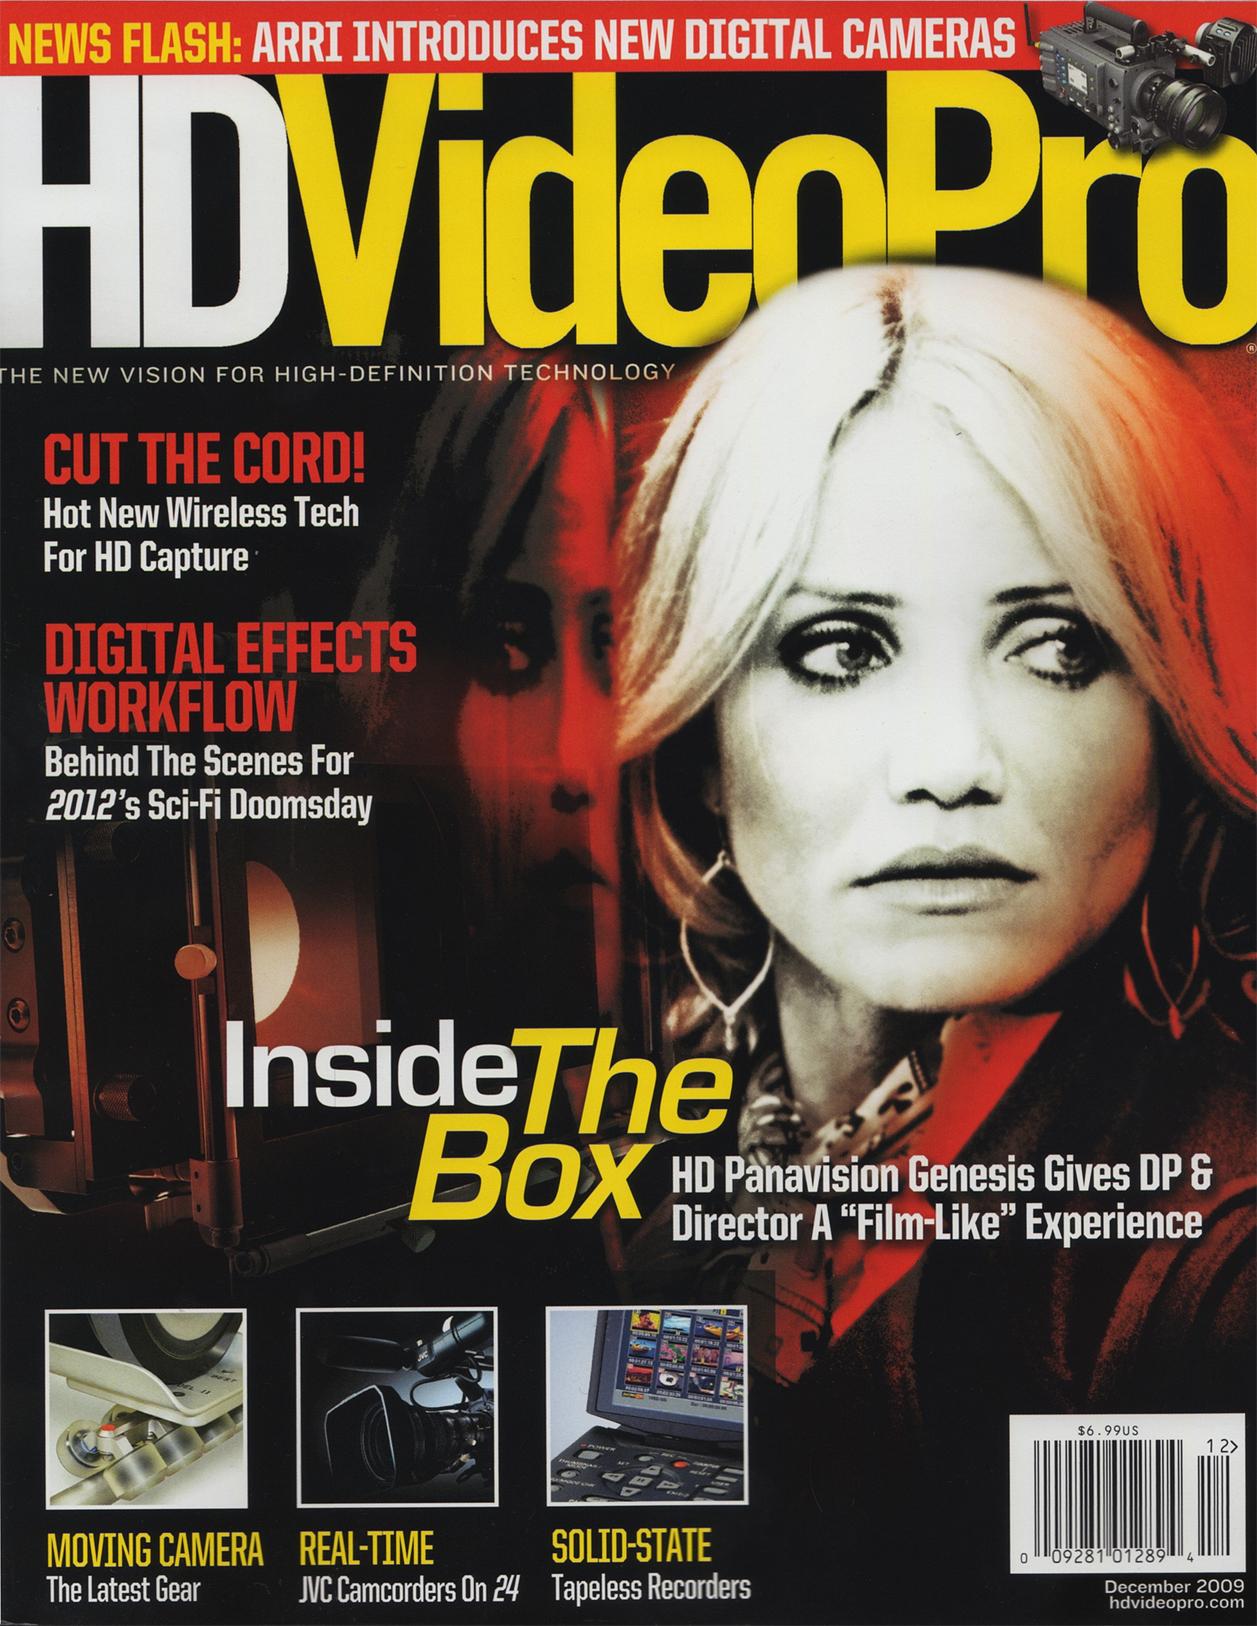 HD Video Pro magazine